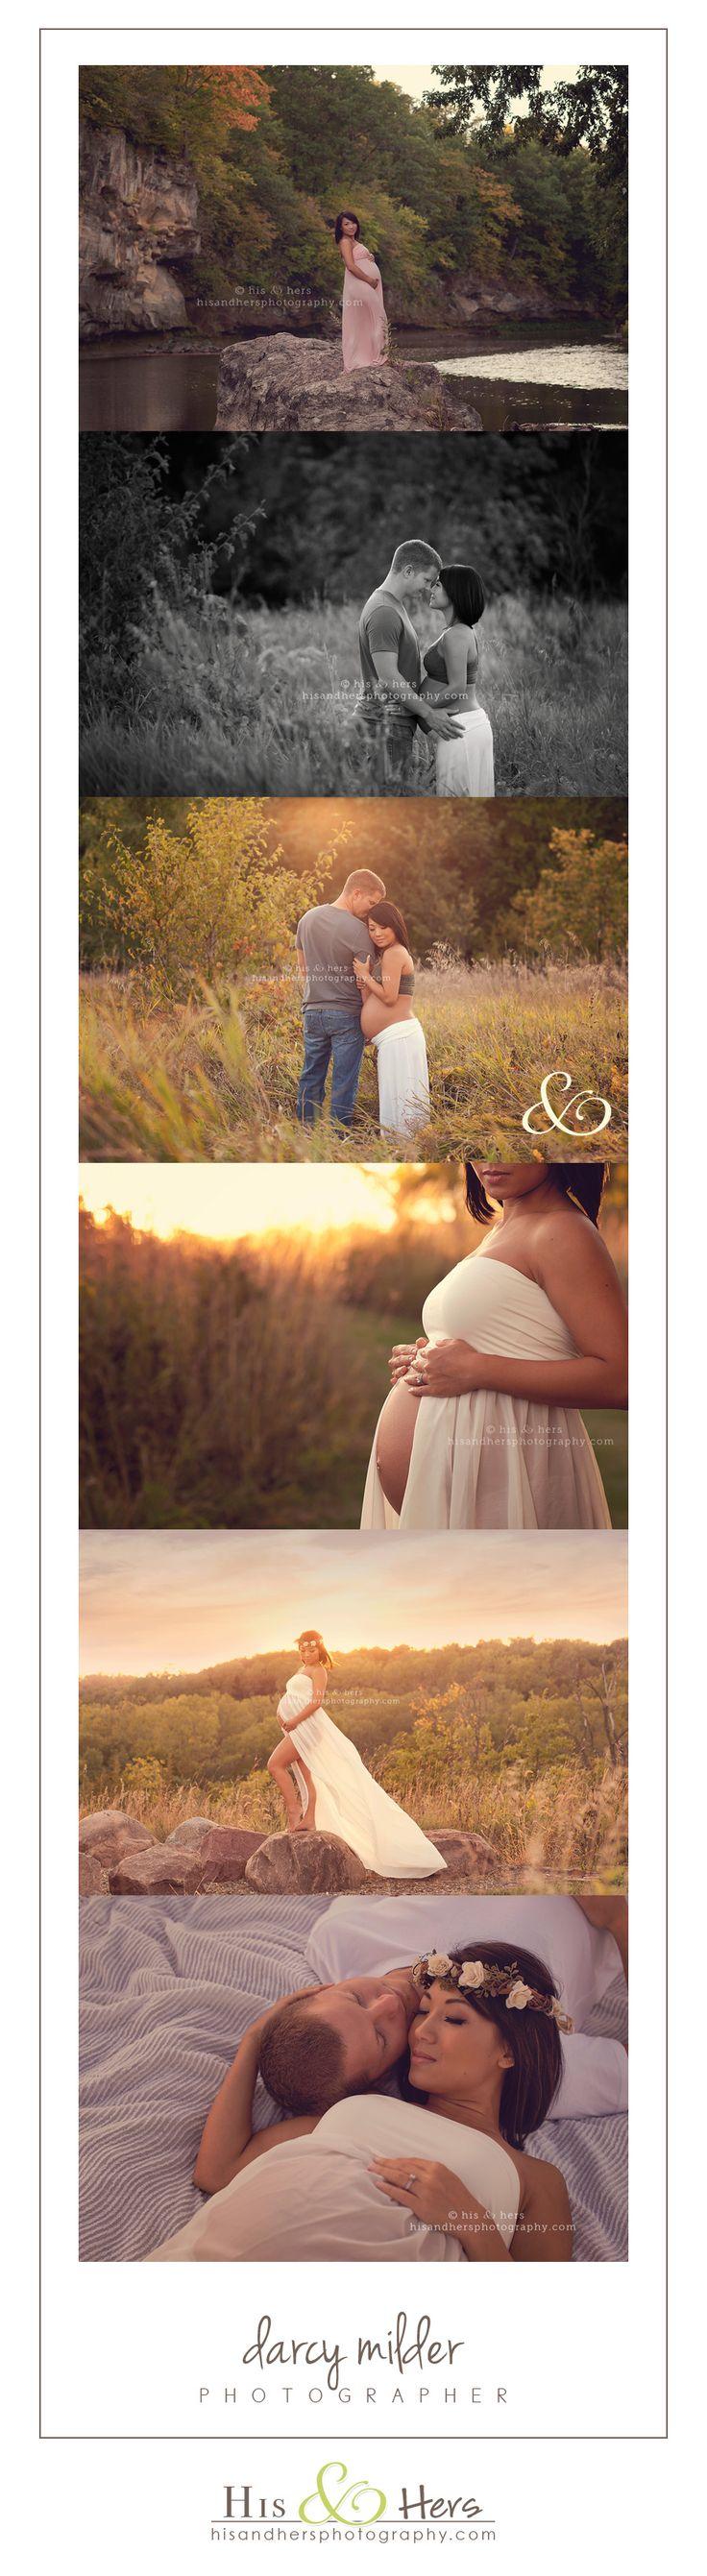 #Iowa #maternitysession #maternityphotographer #maternityphotography artist Darcy Milder, His & Hers, Des Moines, Iowa